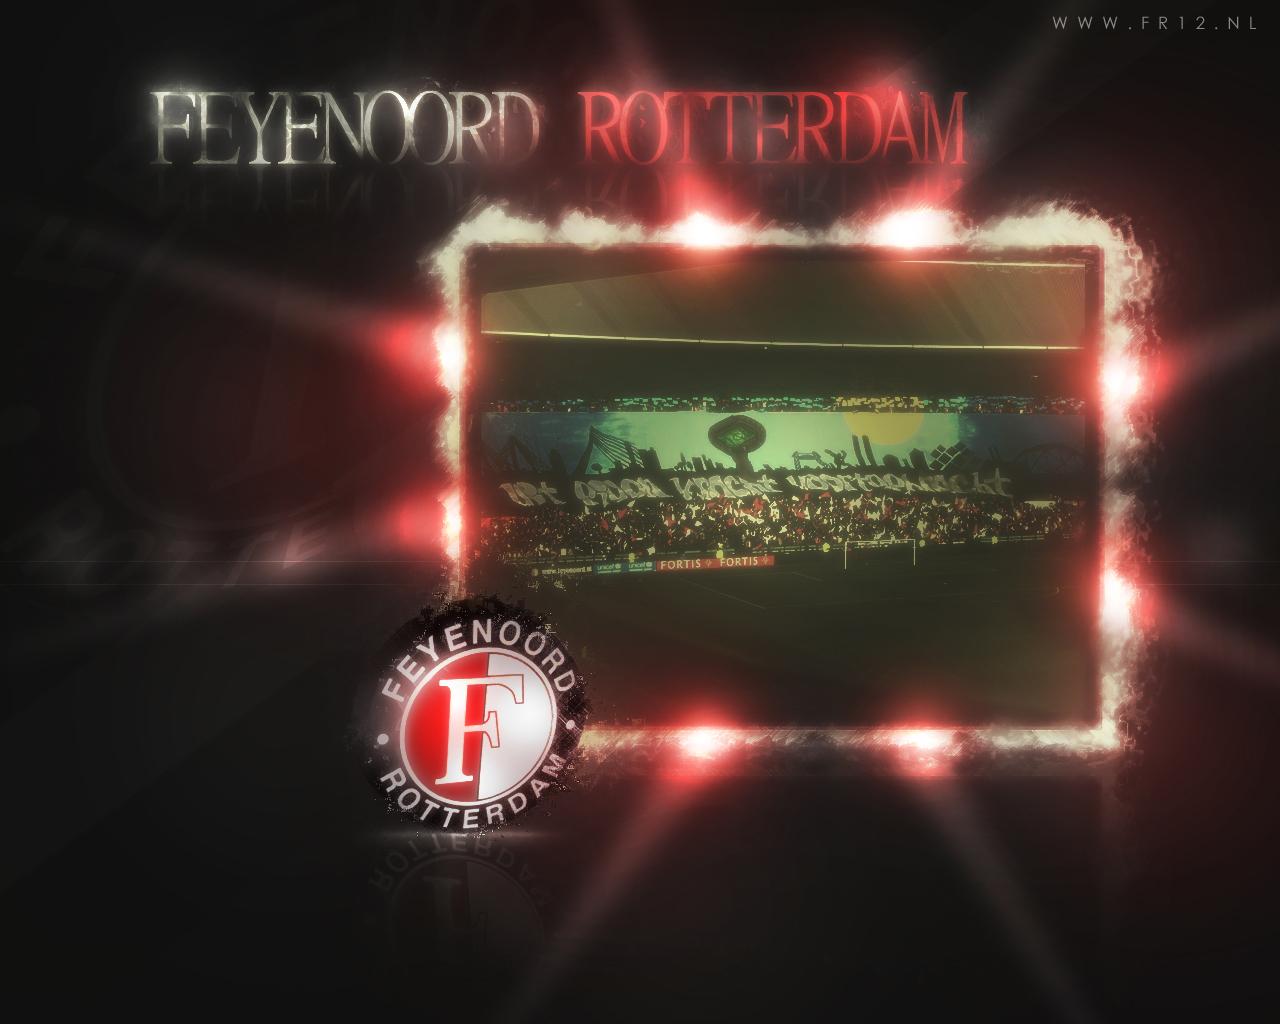 http://4.bp.blogspot.com/_oJpV6yalpOk/TRHL5GSqQRI/AAAAAAAABPE/PvVF_7k-AaA/s1600/Feyenoord-achtergronden-feyenoord-wallpapers-8.jpg